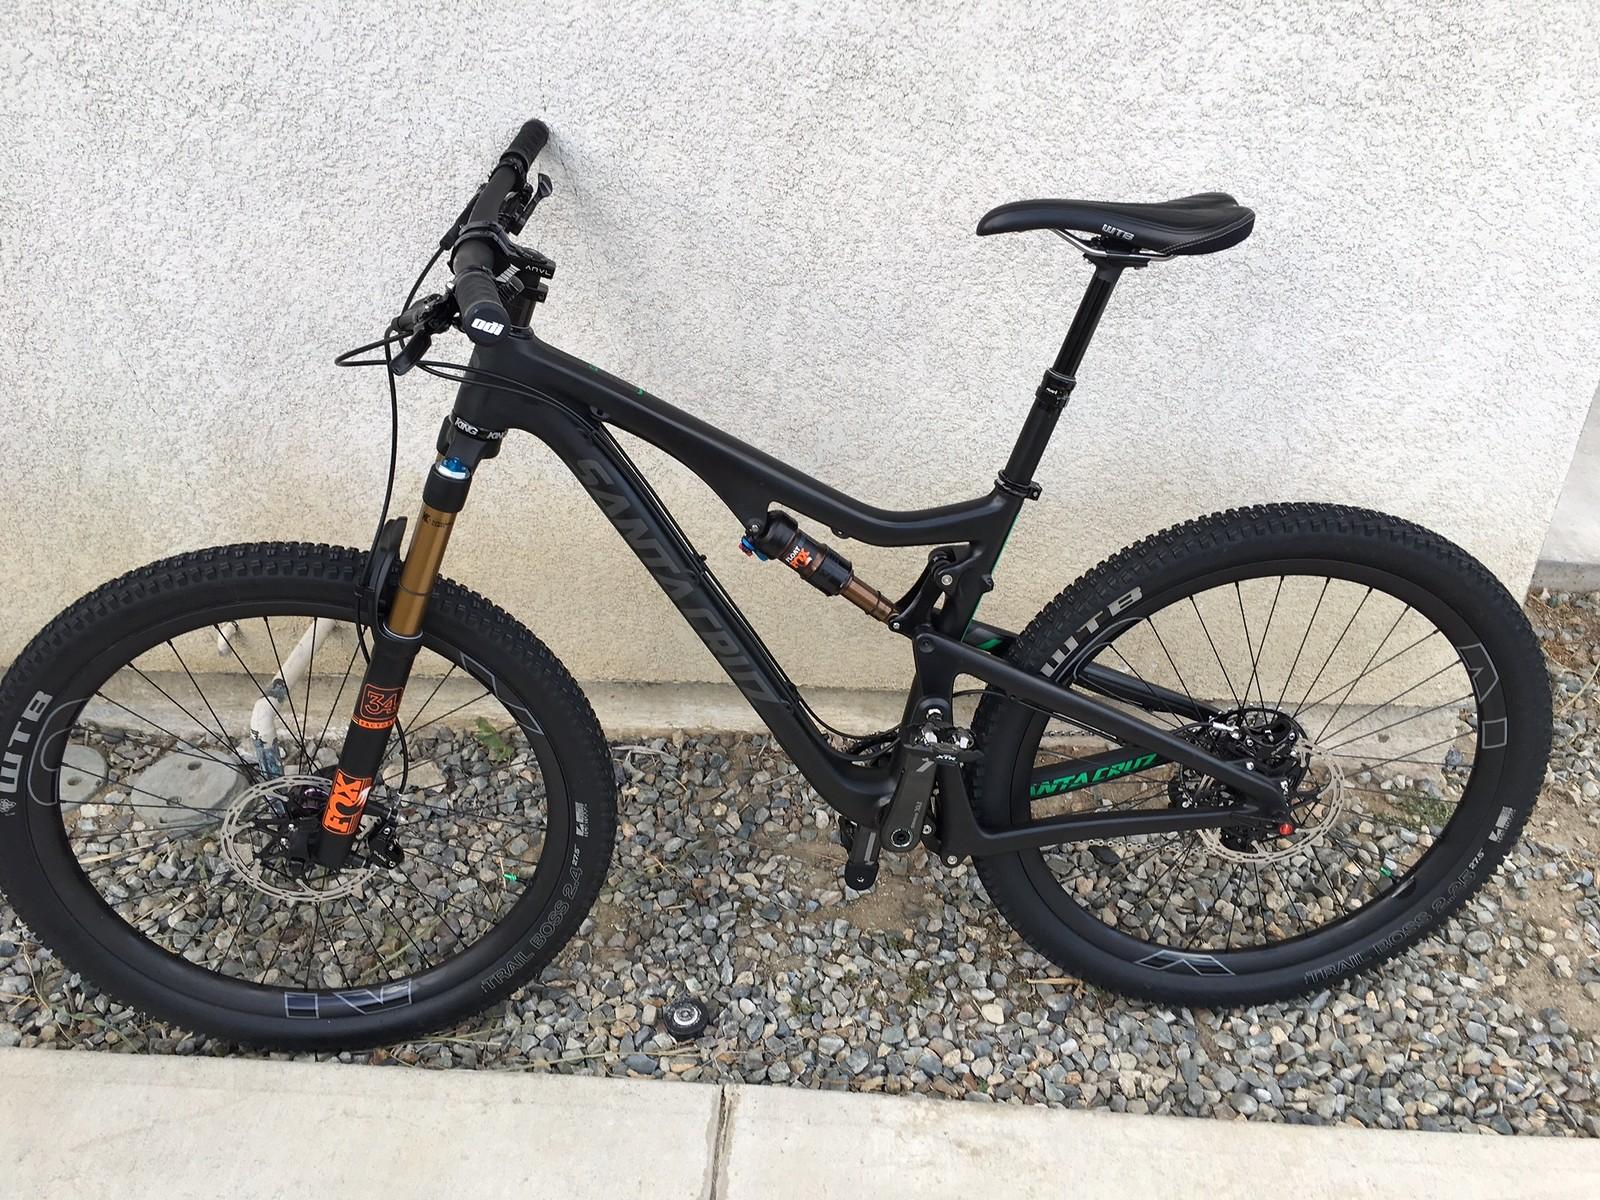 2014 Santa Cruz 5010